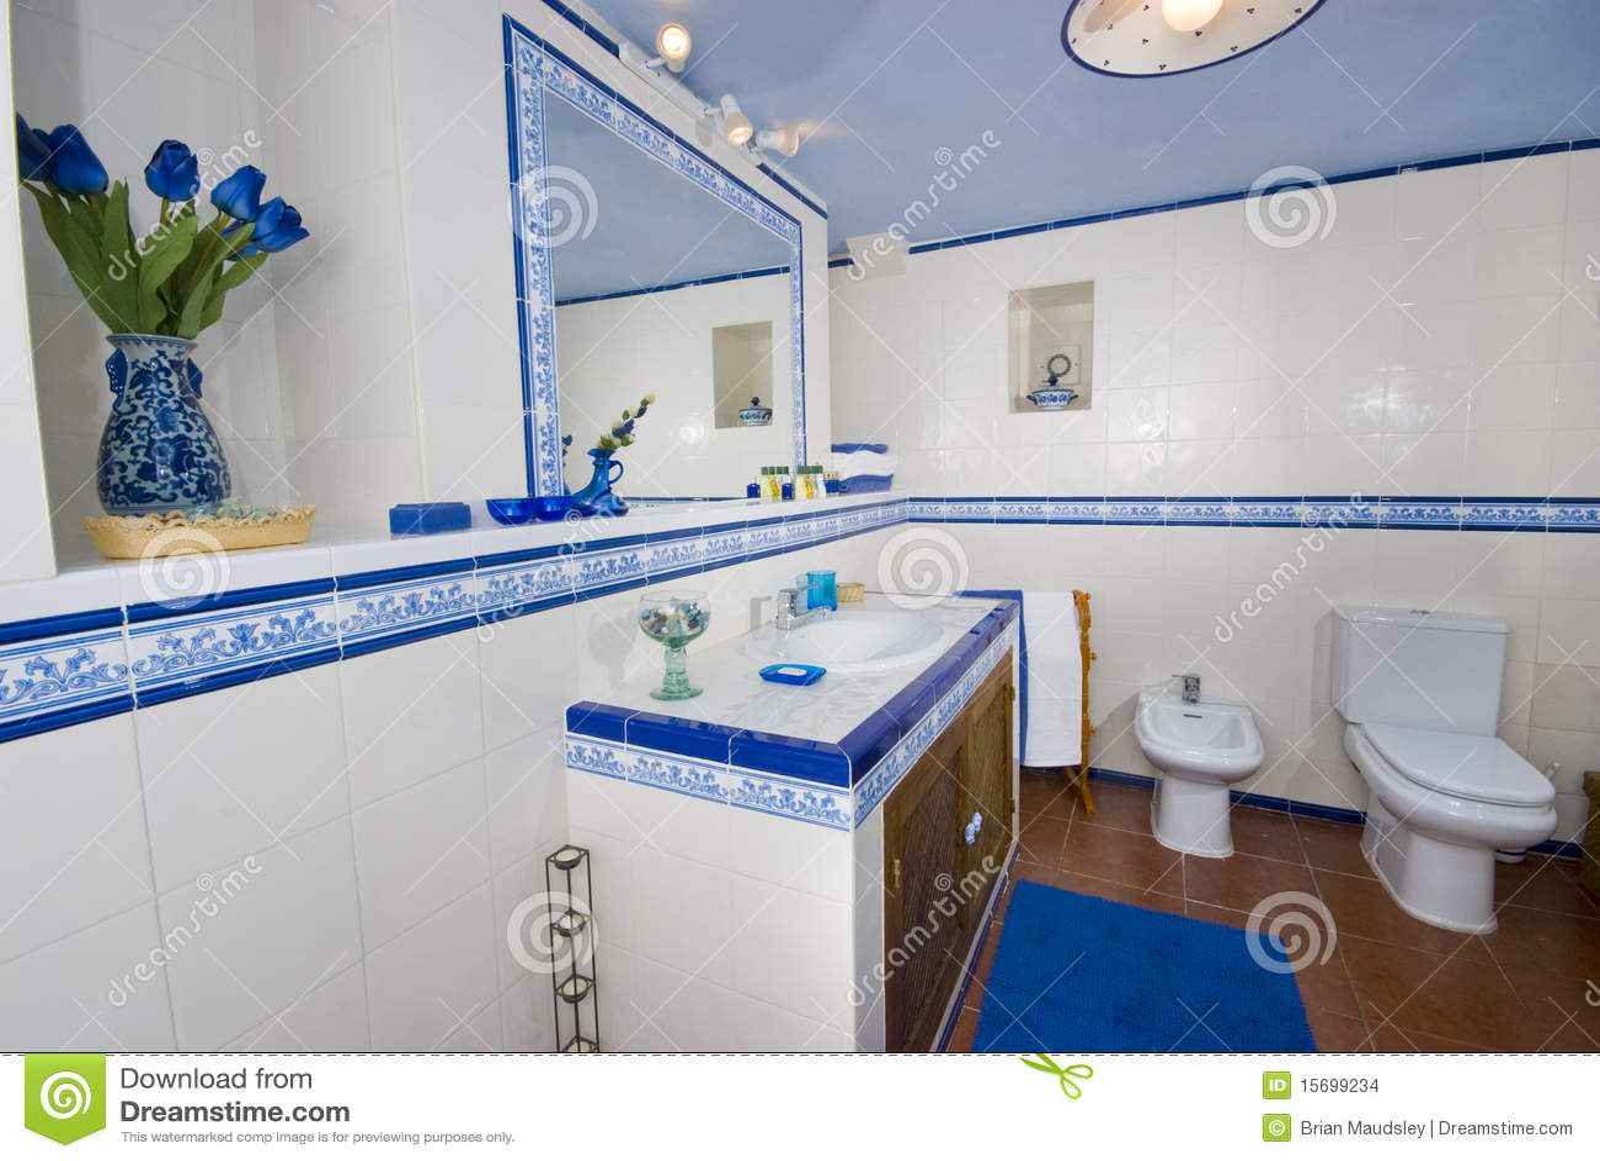 white and blue bathroom stock photo - image: 20376400